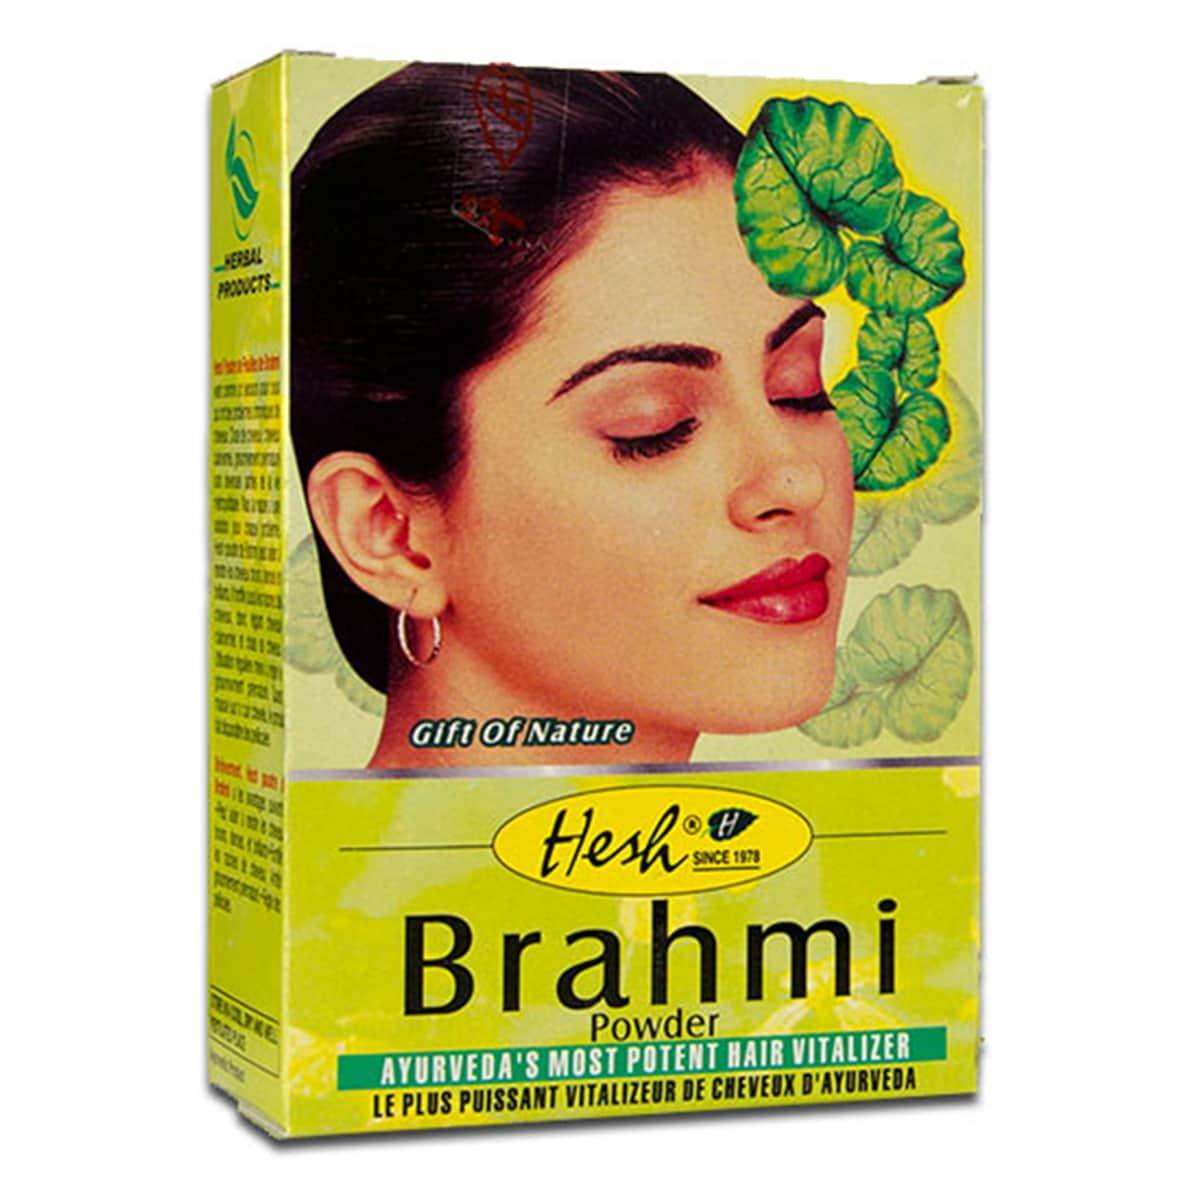 Buy Hesh Brahmi Powder - 100 gm